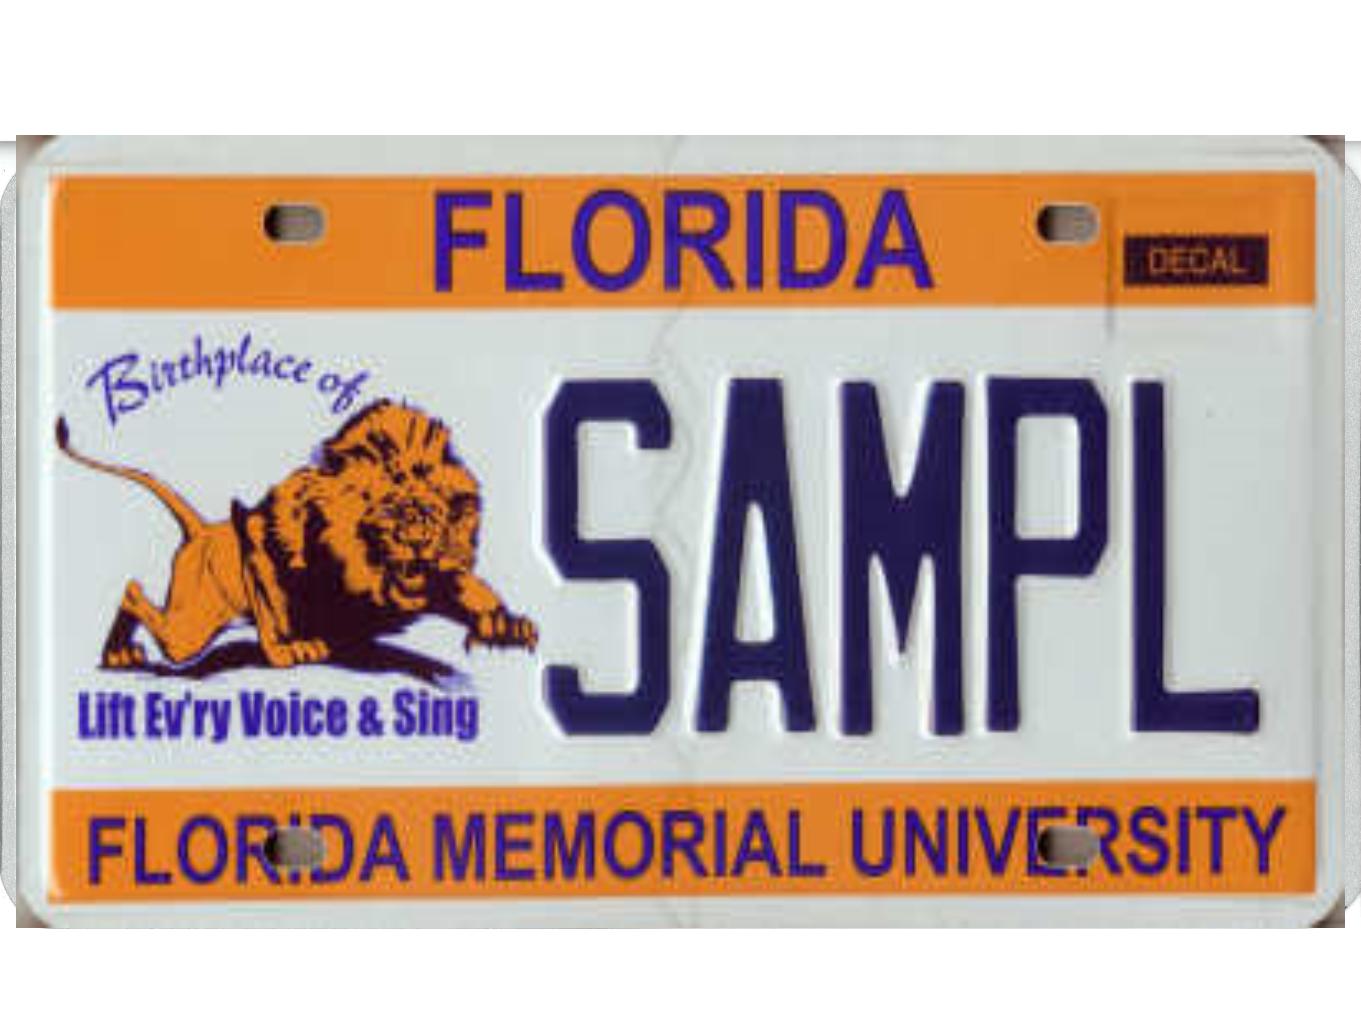 The Florida Memorial University license plate.